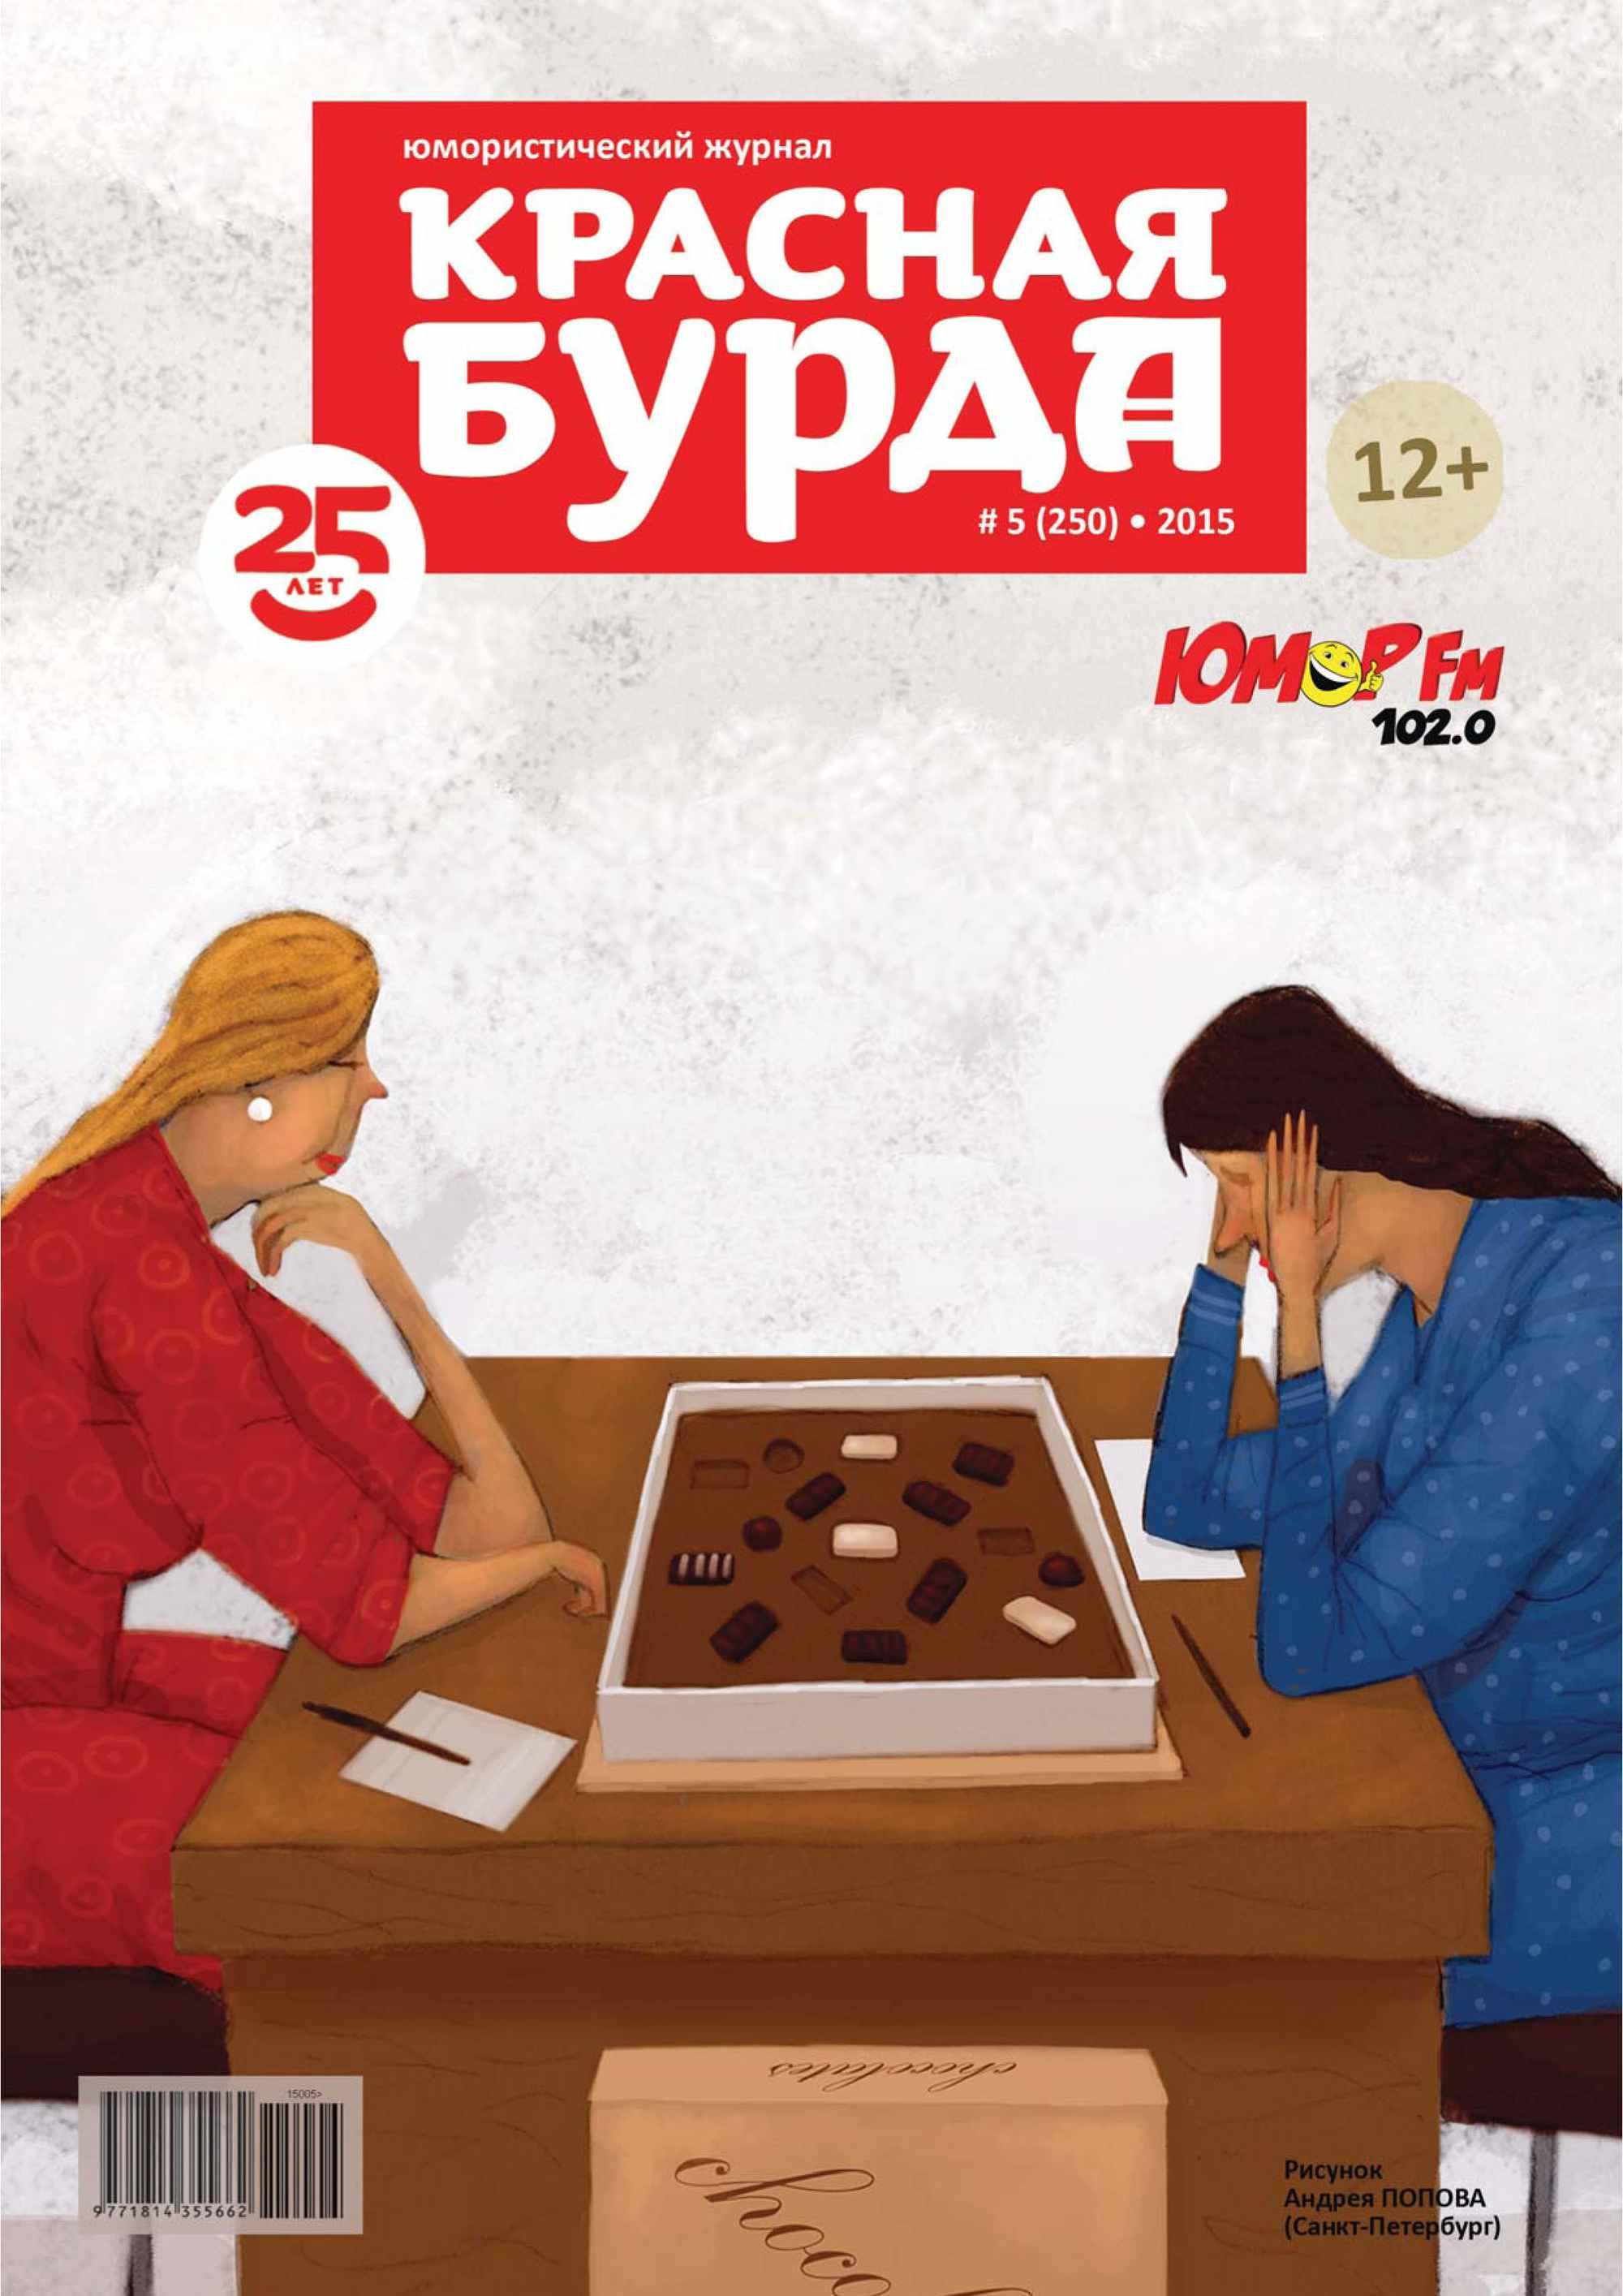 Красная бурда. Юмористический журнал №05 (250) 2015